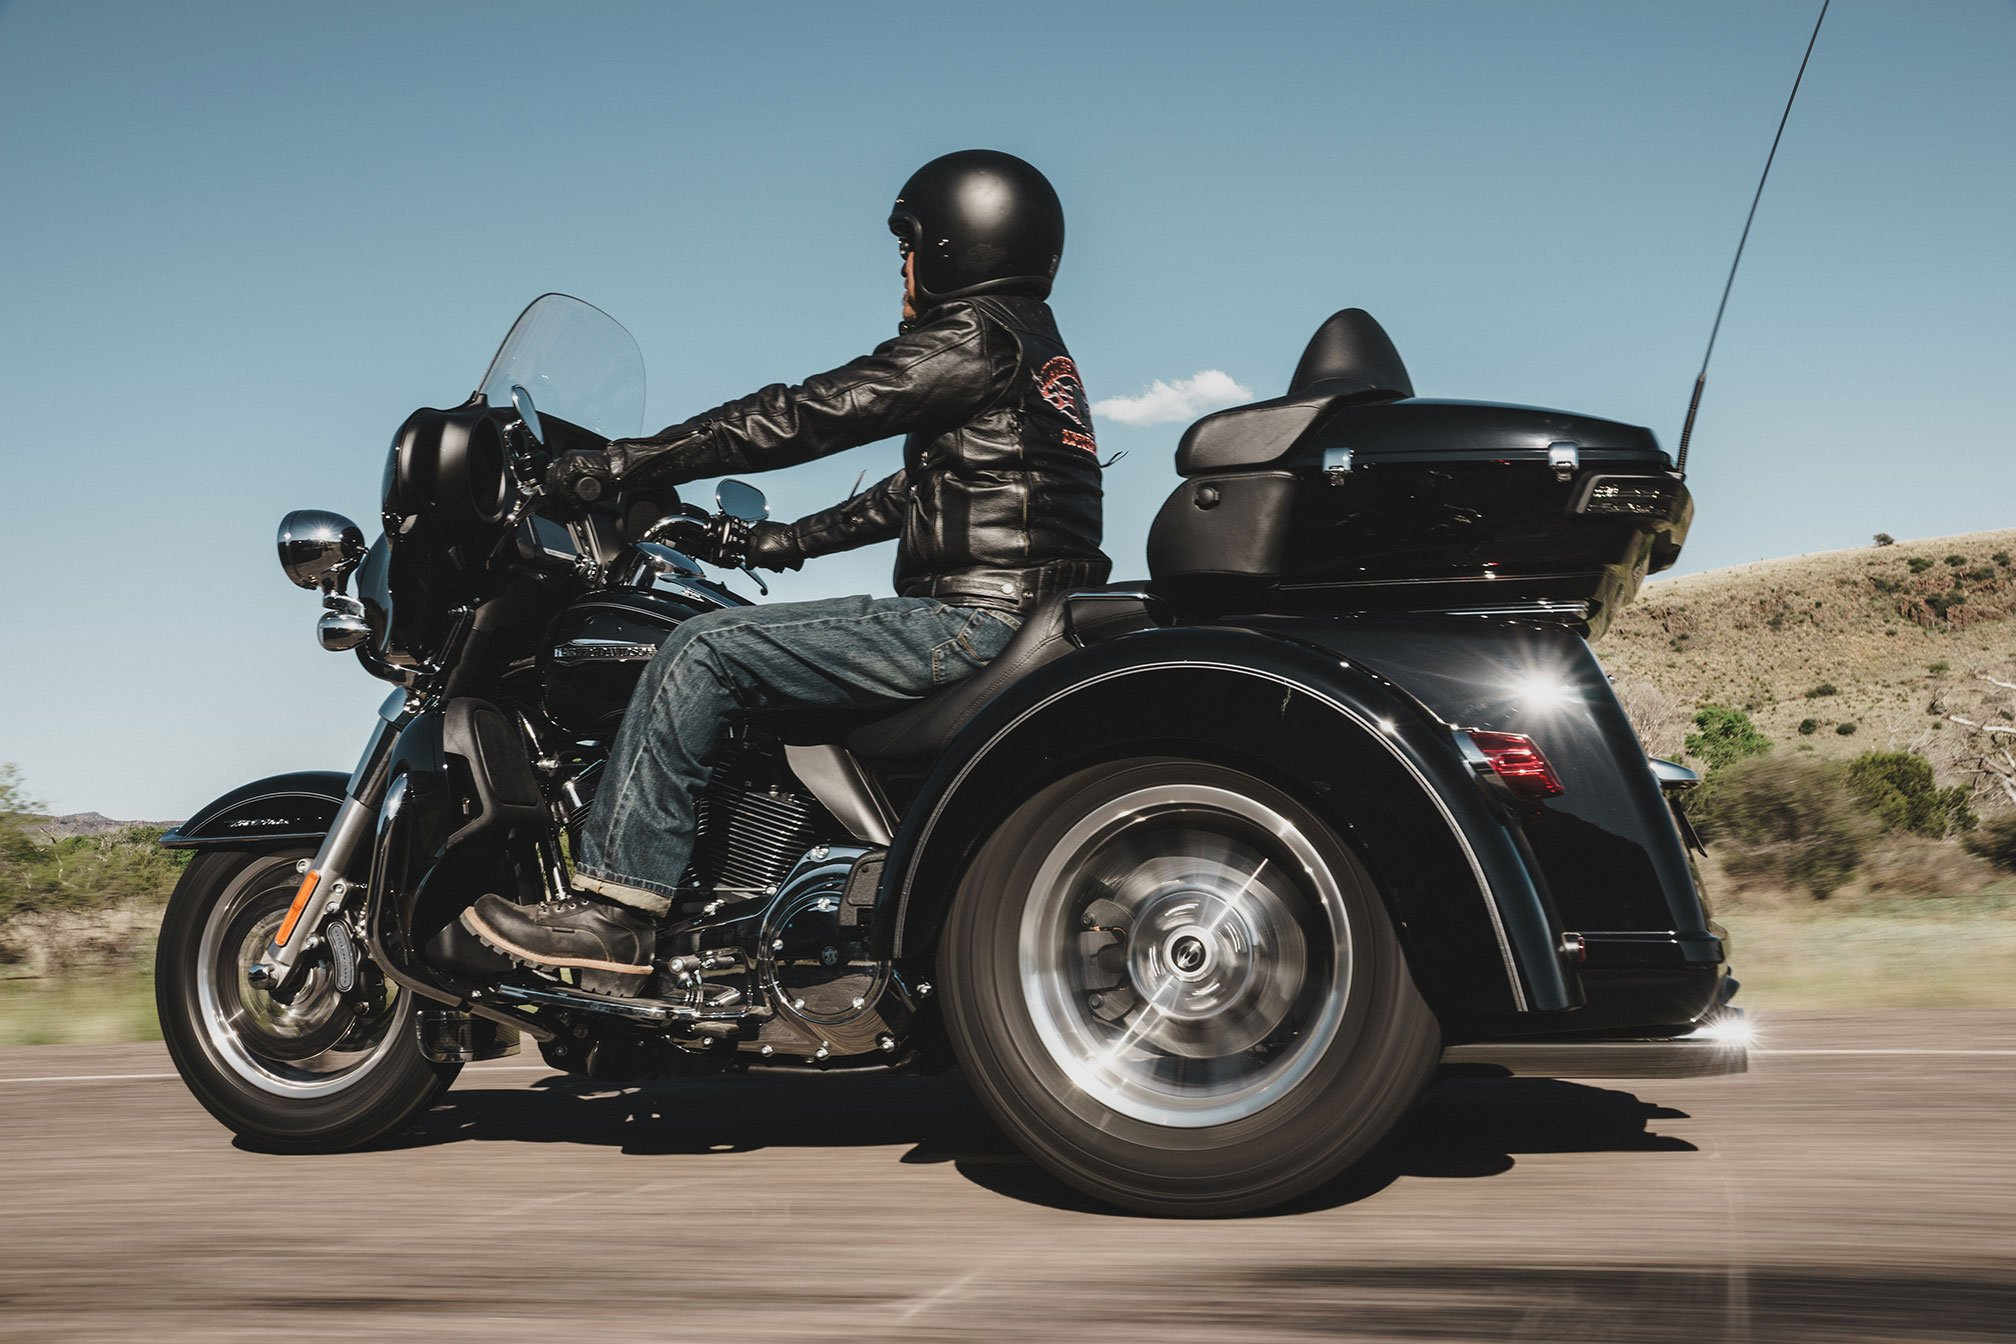 2016 Harley Davidson Trike Tri Glide Ultra Motorbike Bike